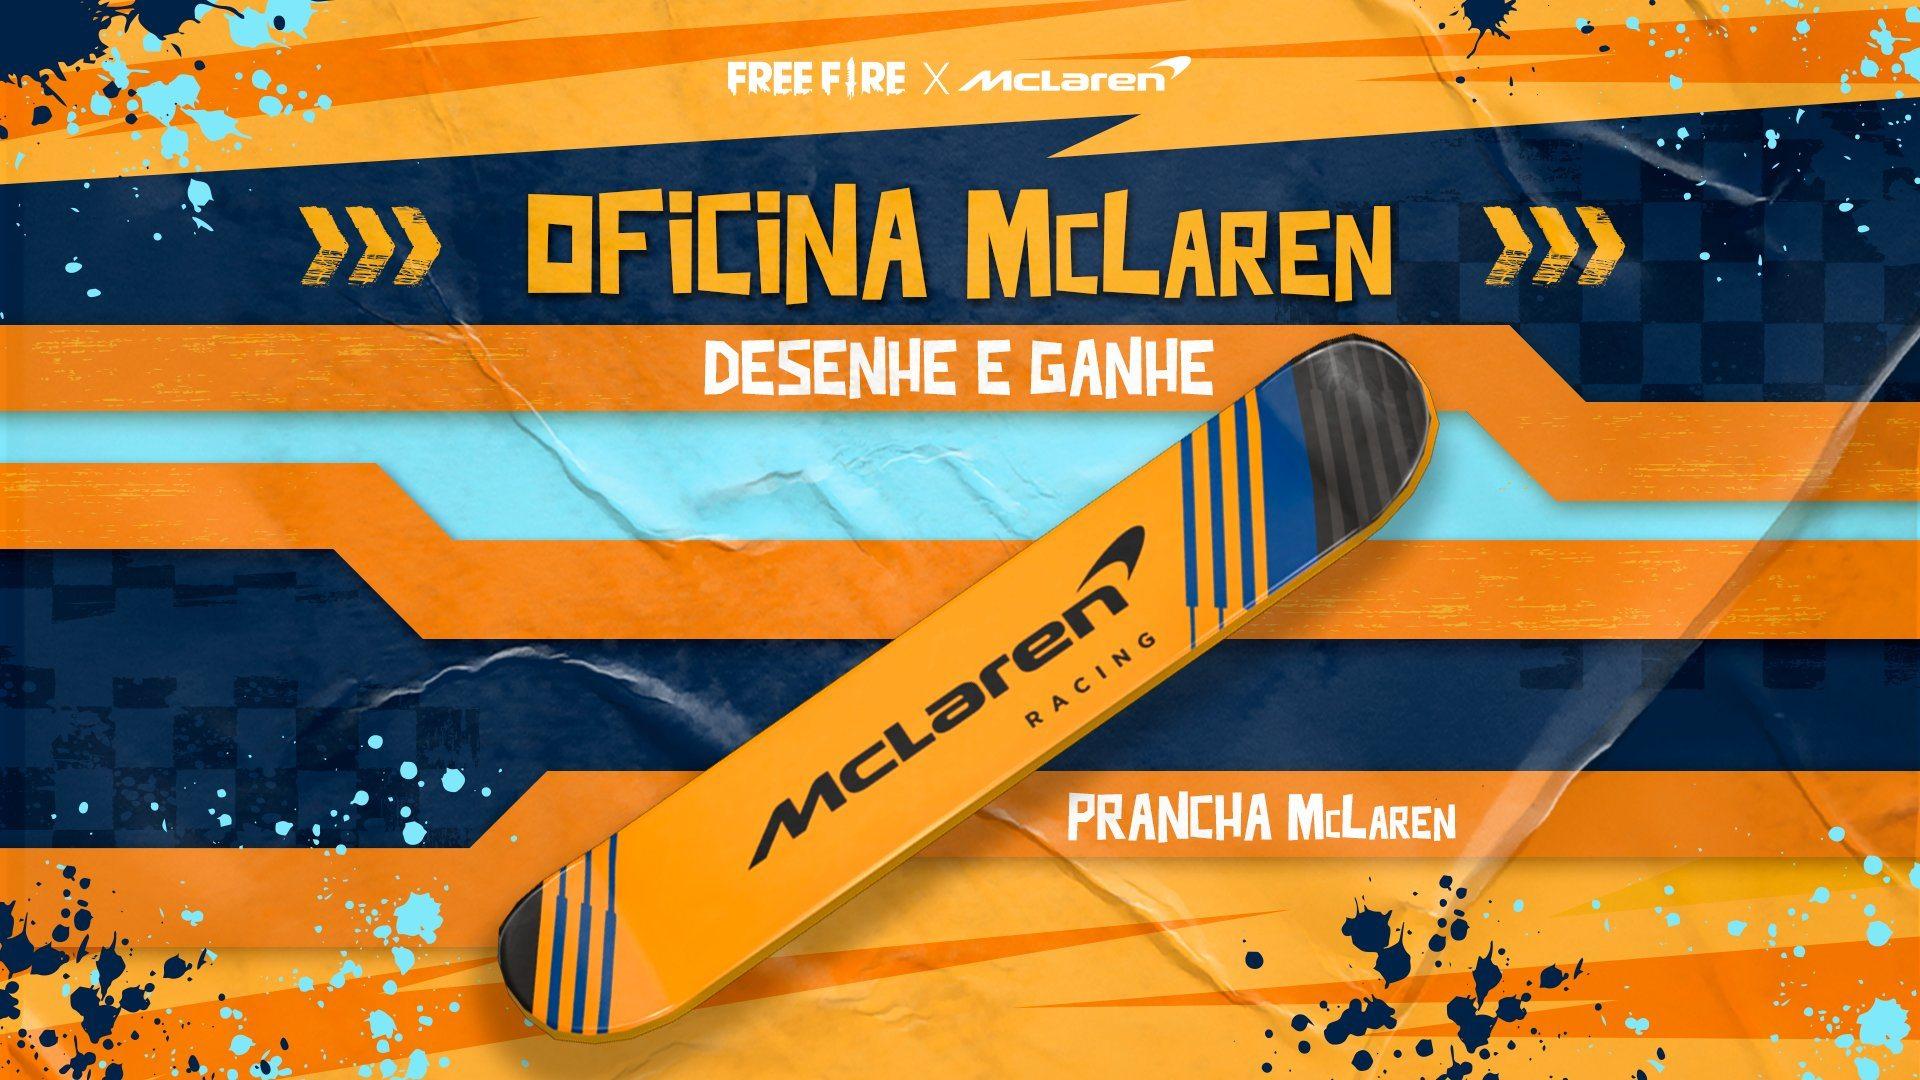 Parceria entre Garena Free Fire e McLaren premia jogadores até o dia 4 de agosto